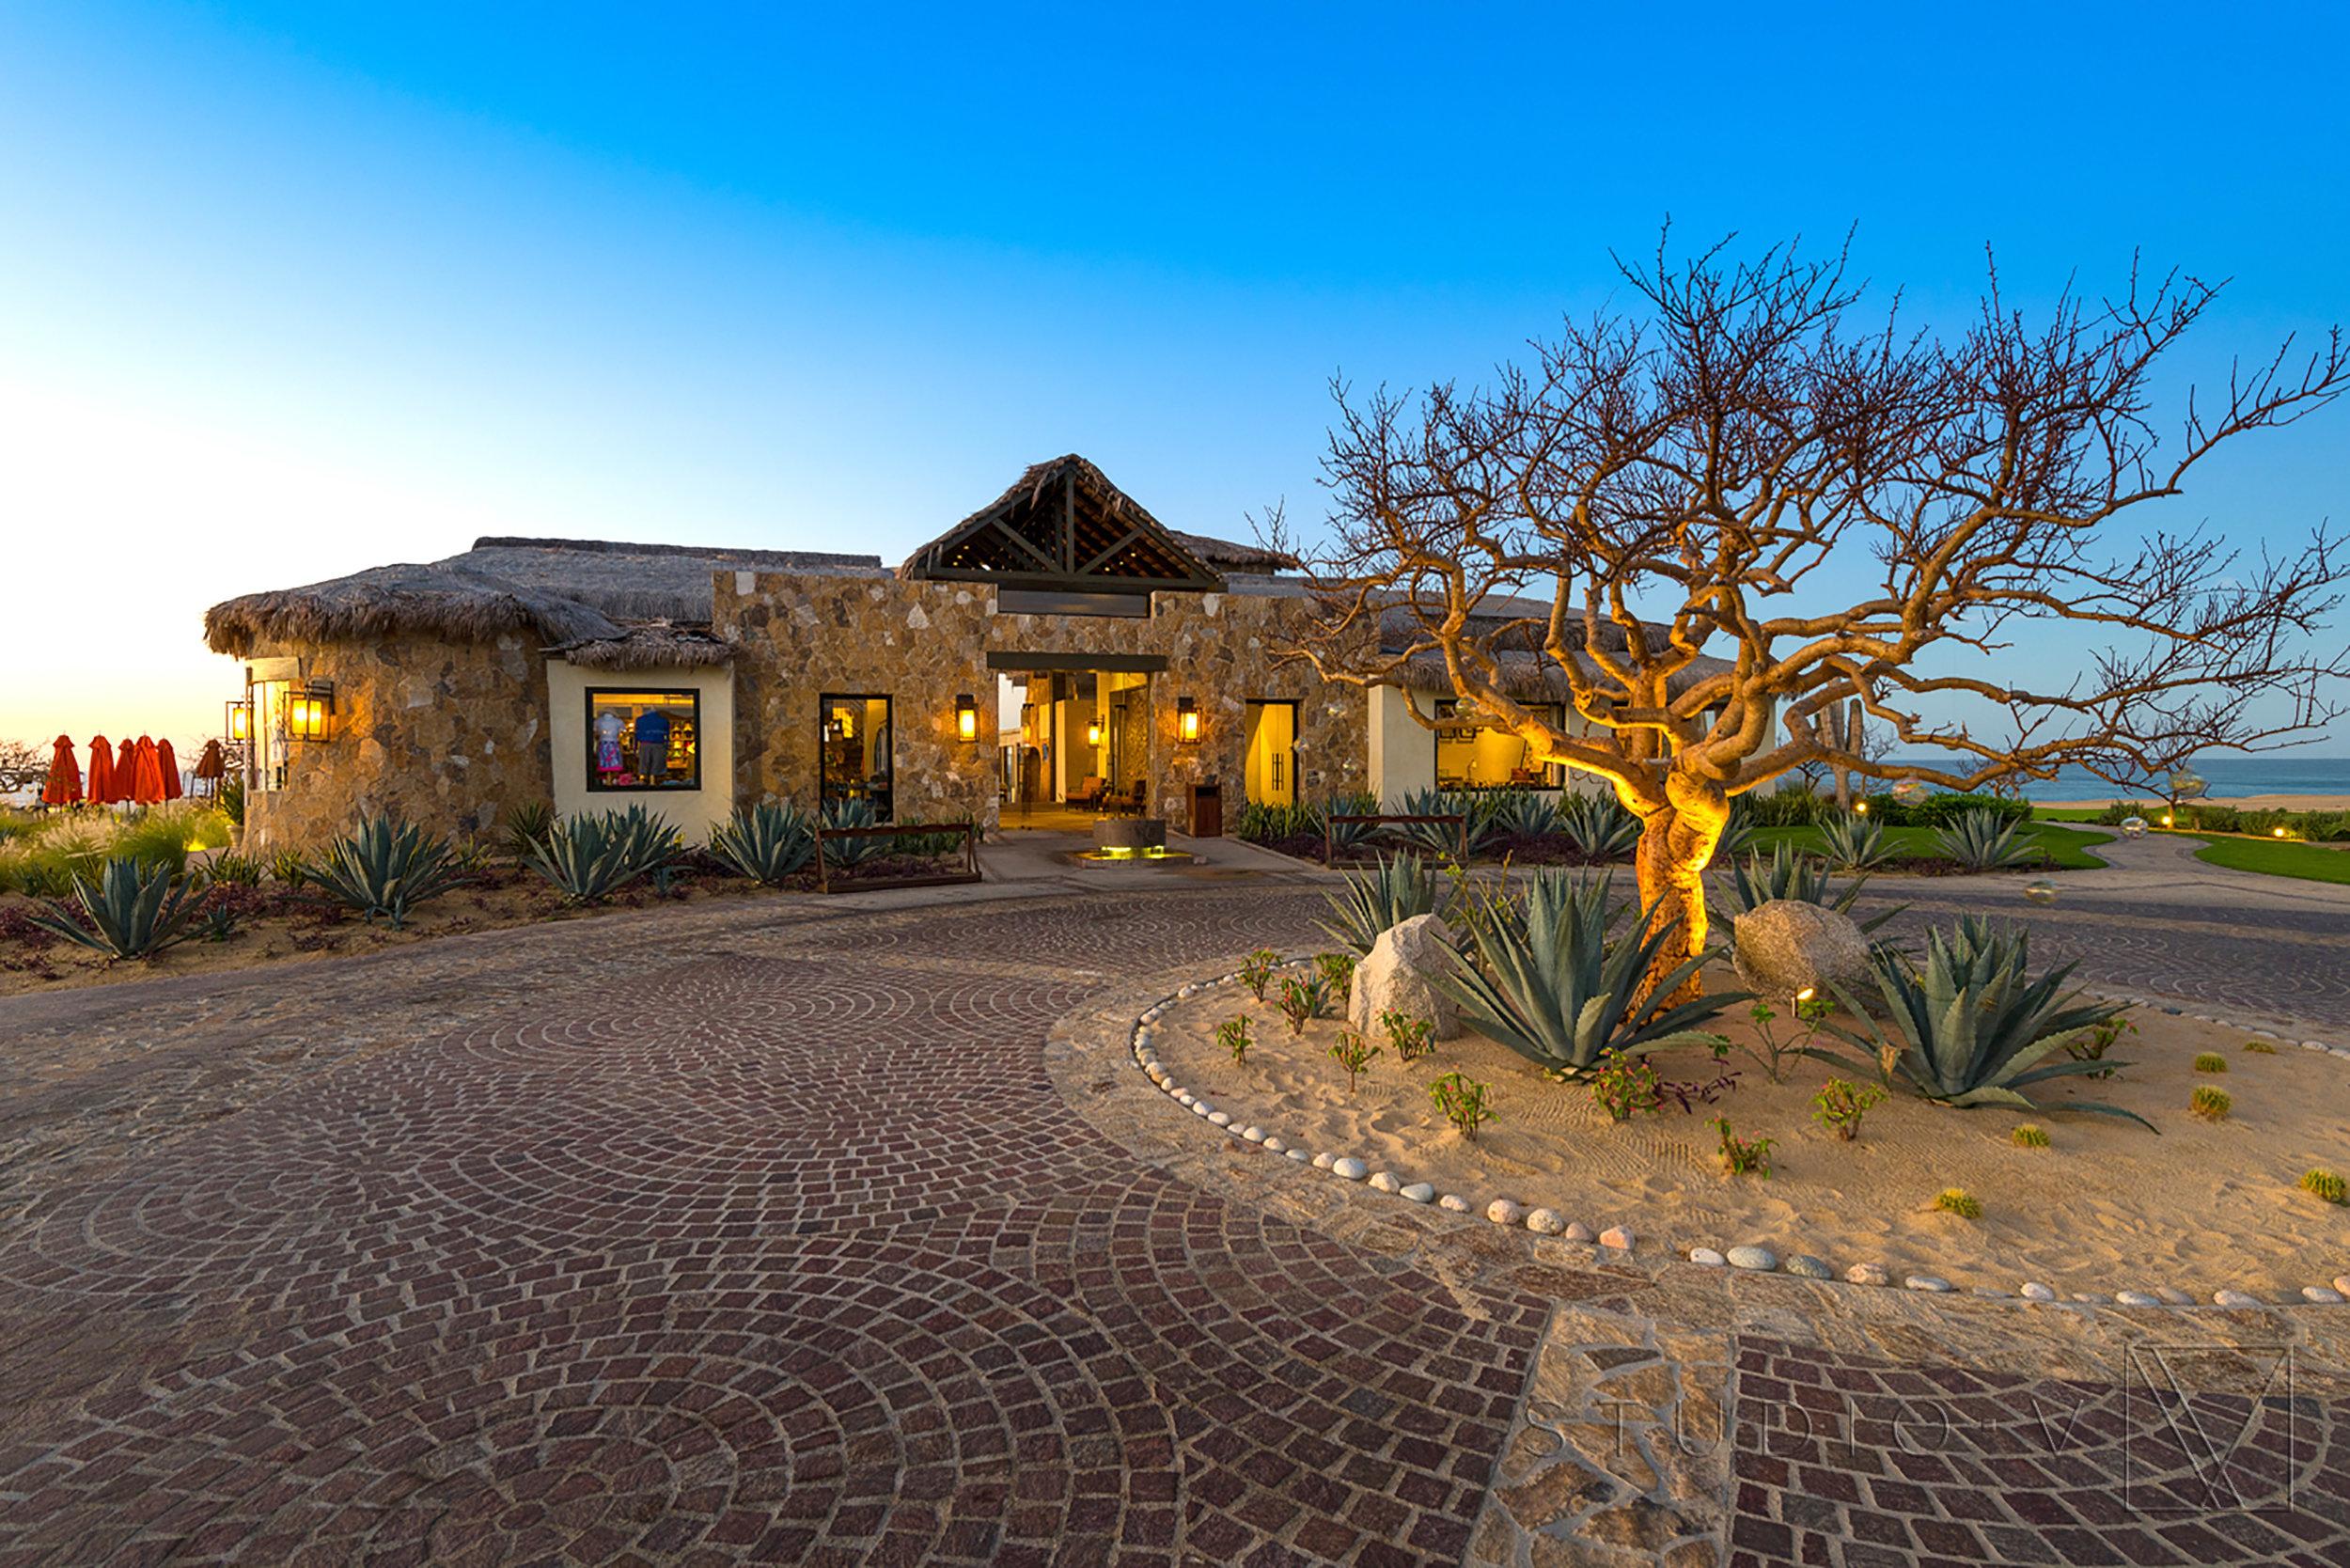 Quivira Clubhouse Sunset Beach Cabo San Lucas Studio V Interior Architecture and Design Scottsdale Arizona AZ (12).jpg